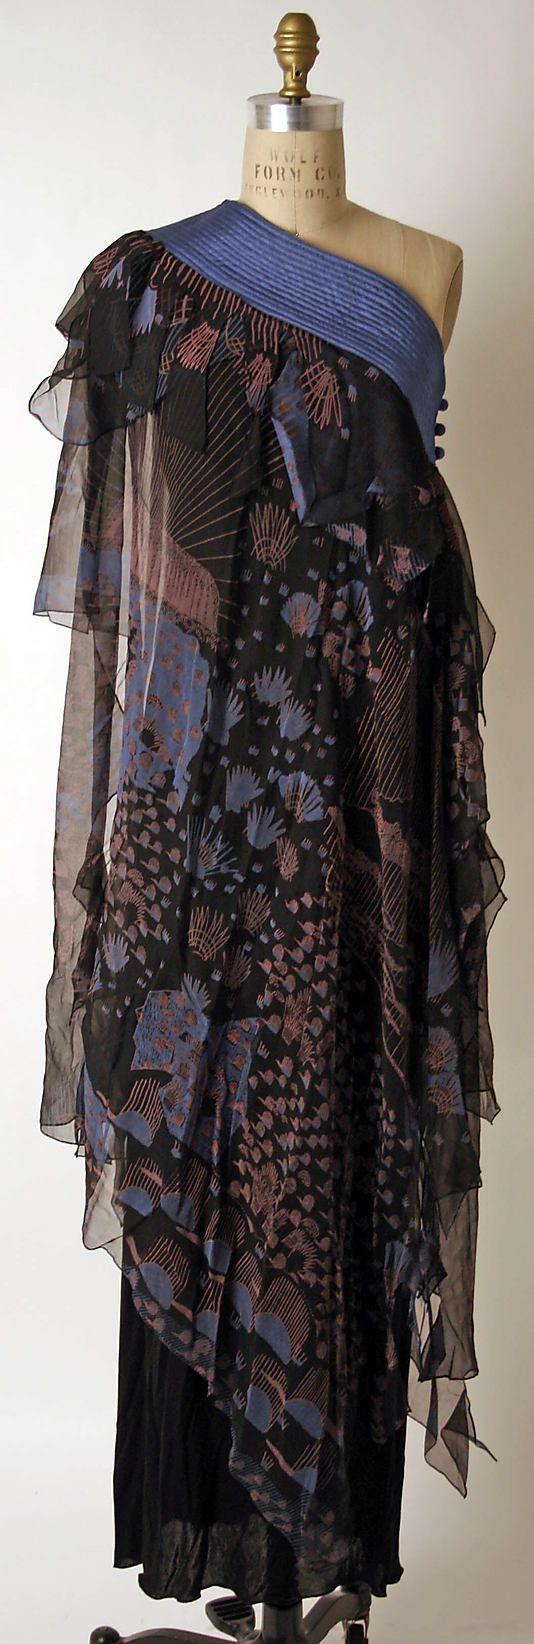 Evening dress  Zandra Rhodes (British, born 1940)  Department Store: Henri Bendel (American, founded 1895) Date: ca. 1974 Culture: British Medium: Silk